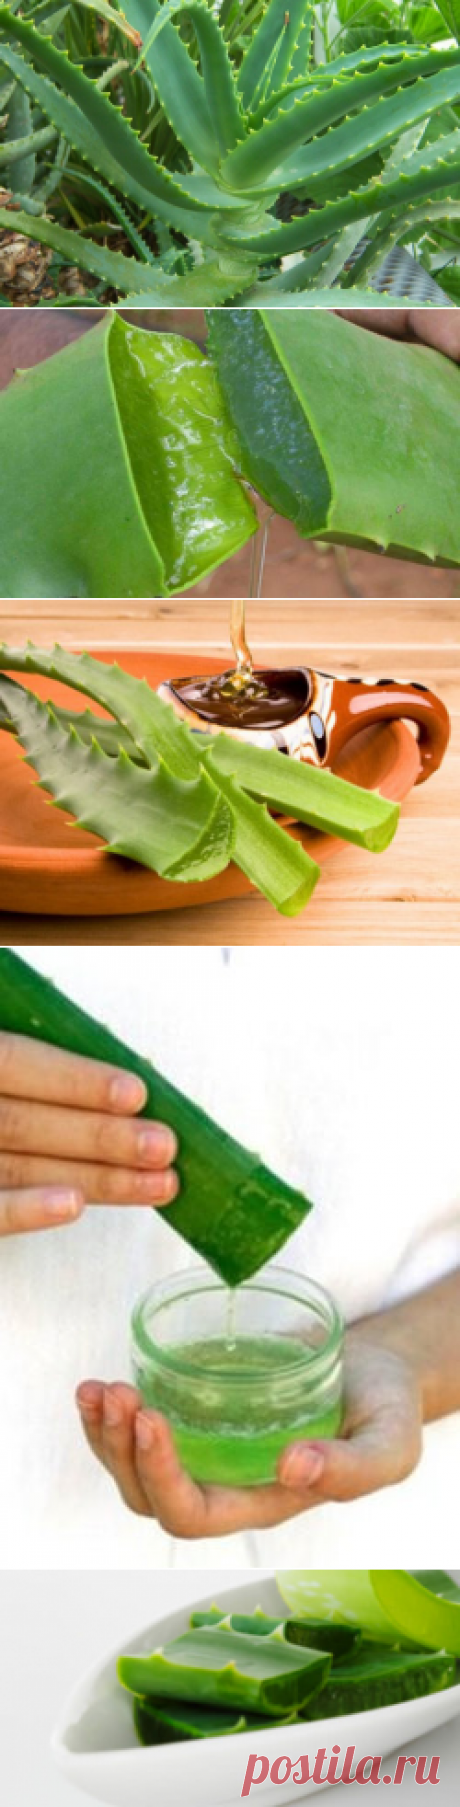 Aloe – useful properties and application of an aloe — Always in shape!